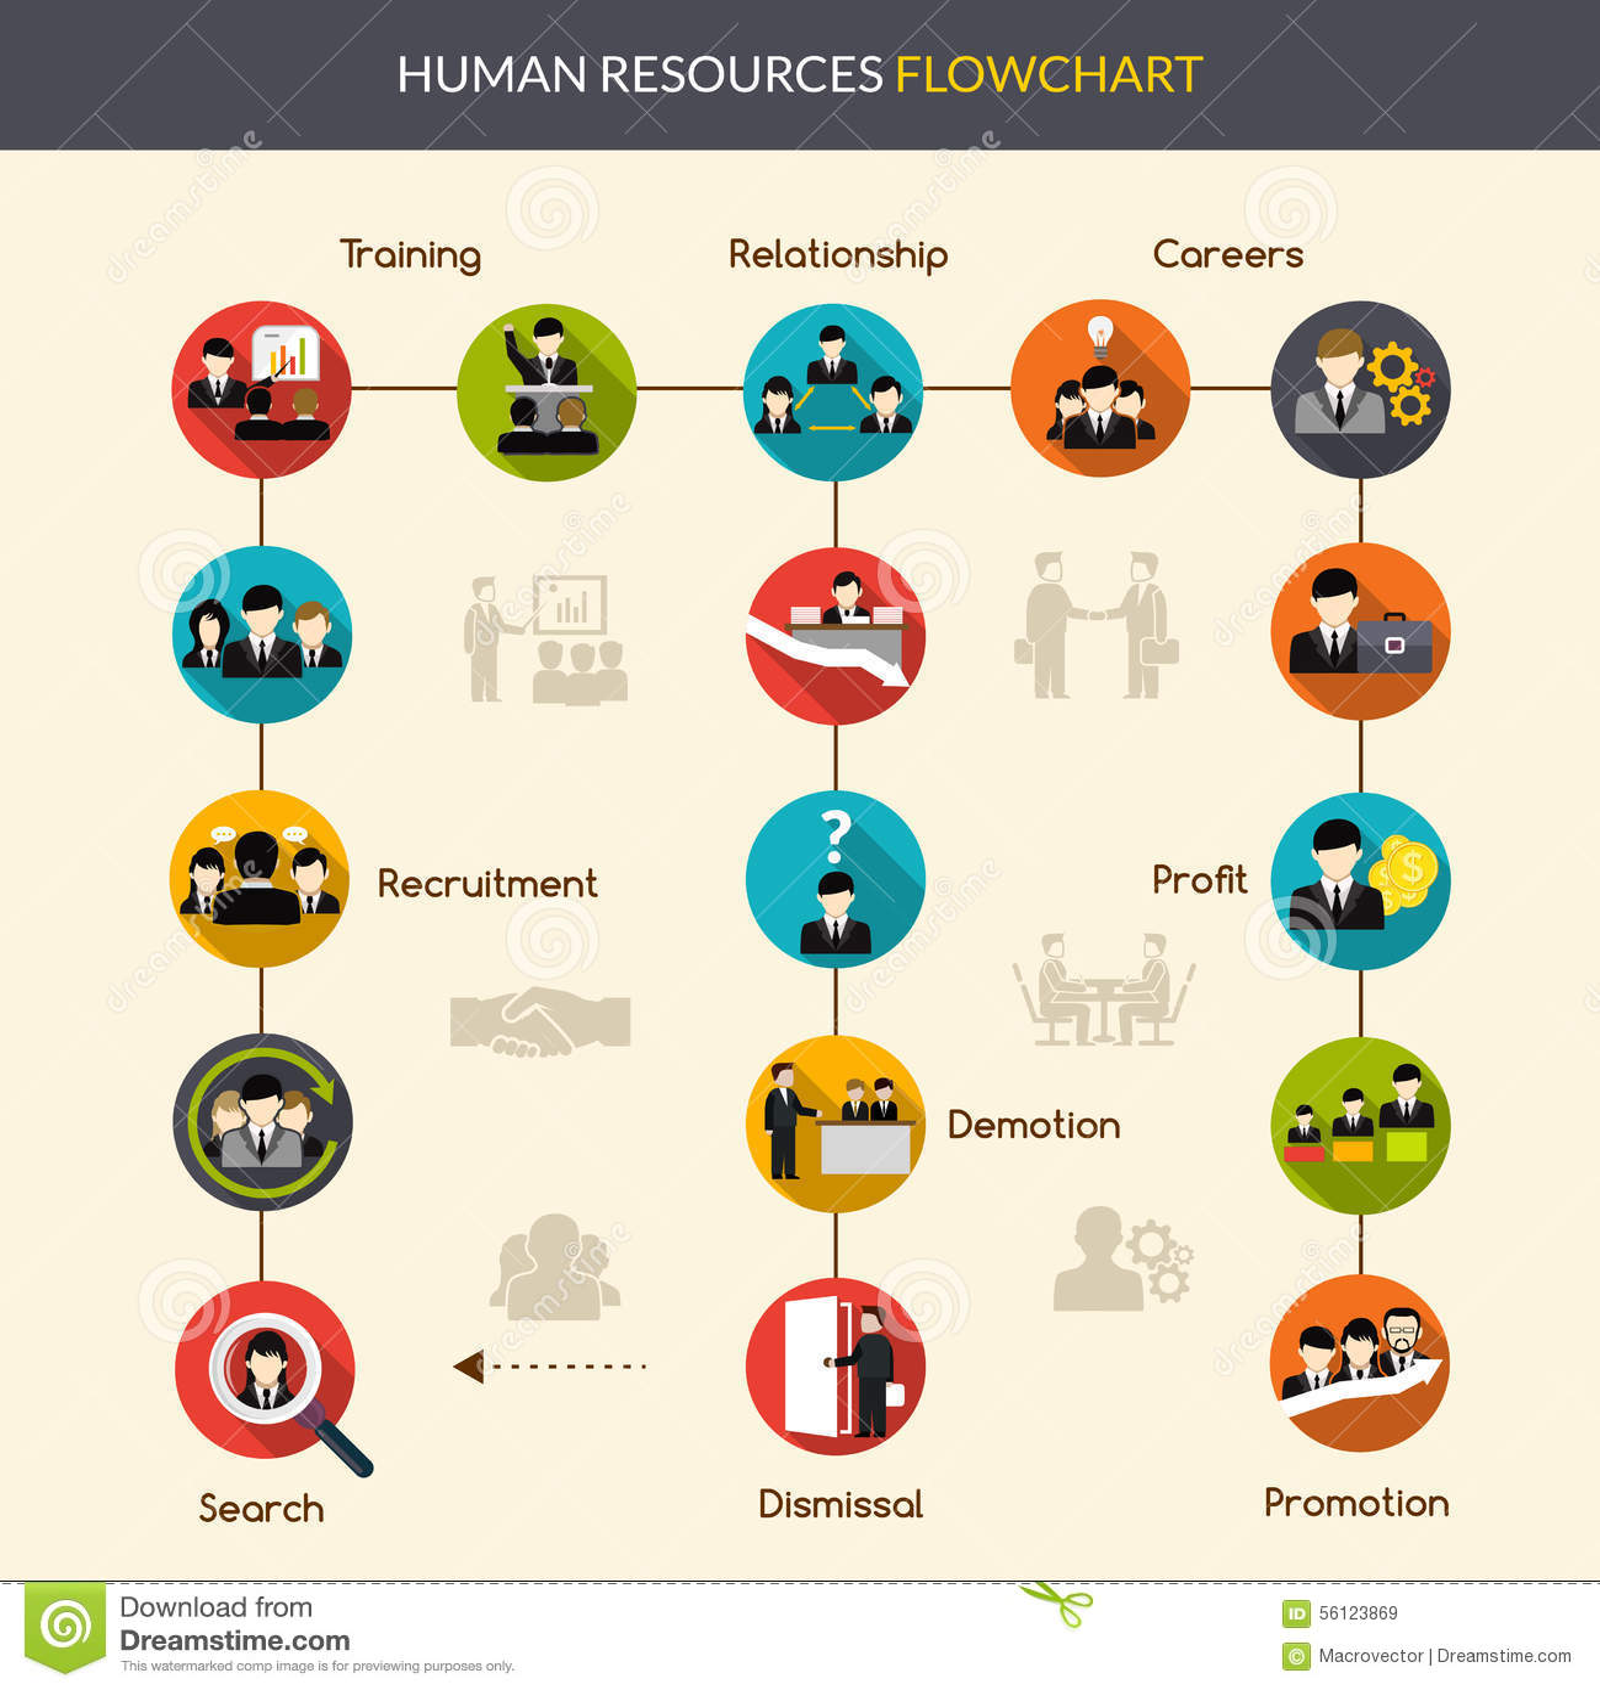 Human Resources Flowchart Stock Vector Illustration Of Corporate